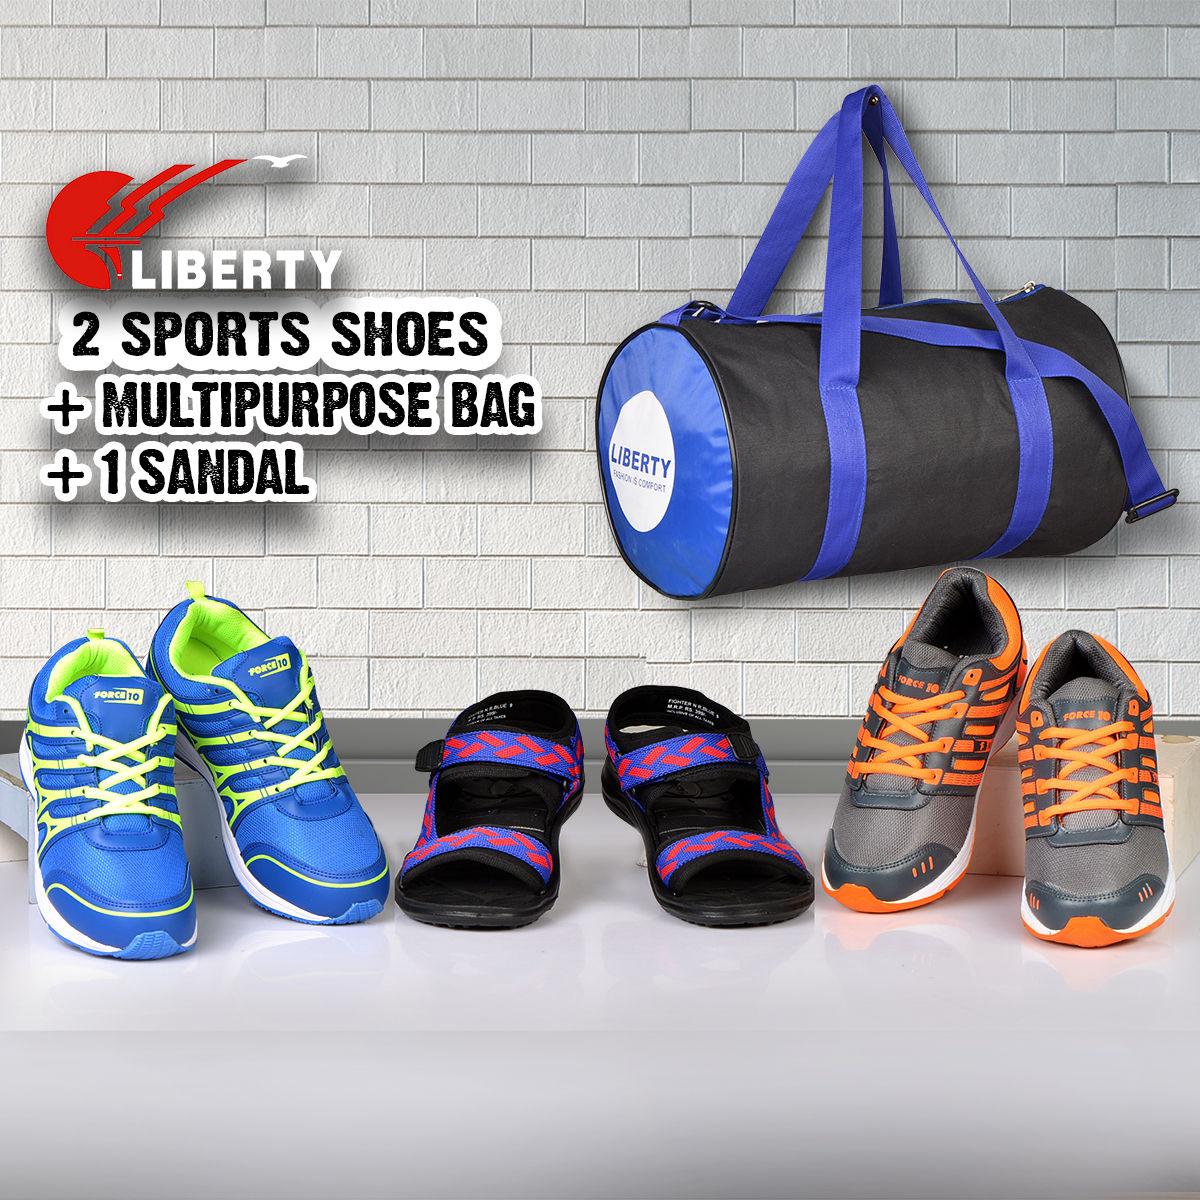 Buy liberty sports shoes multipurpose bag sandal